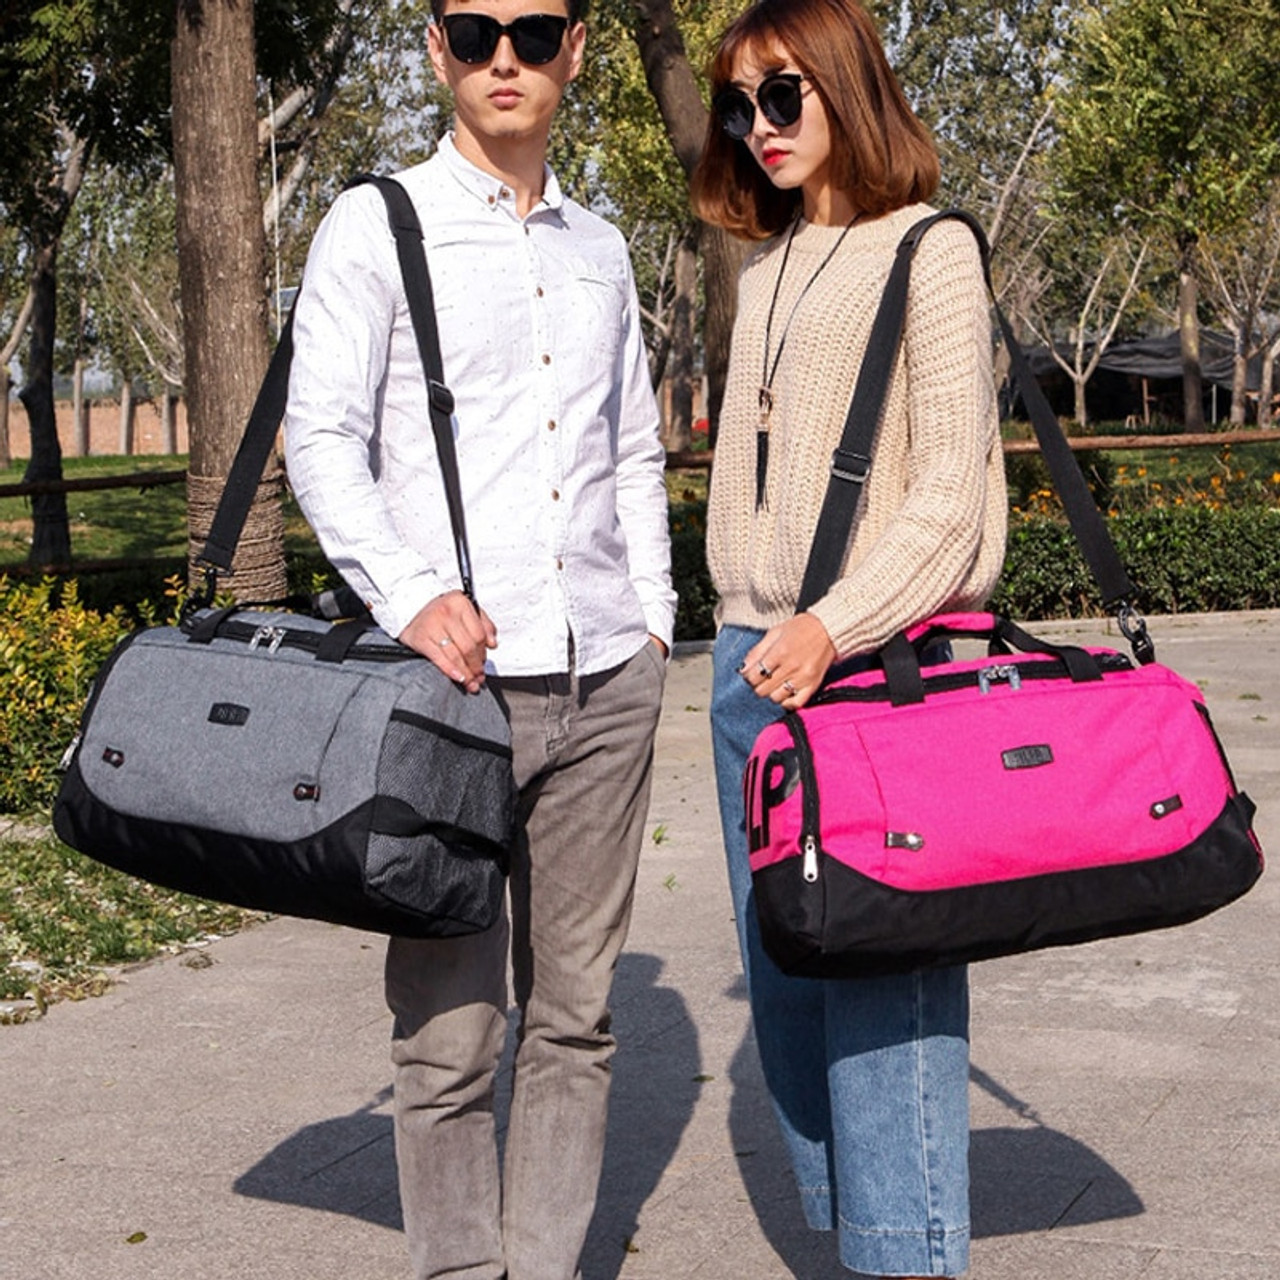 Scione Nylon Travel Bag Large Capacity Men Hand Luggage Travel Duffle Bags Nylon Weekend Bags Women Multifunctional Travel Bags Onshopdeals Com